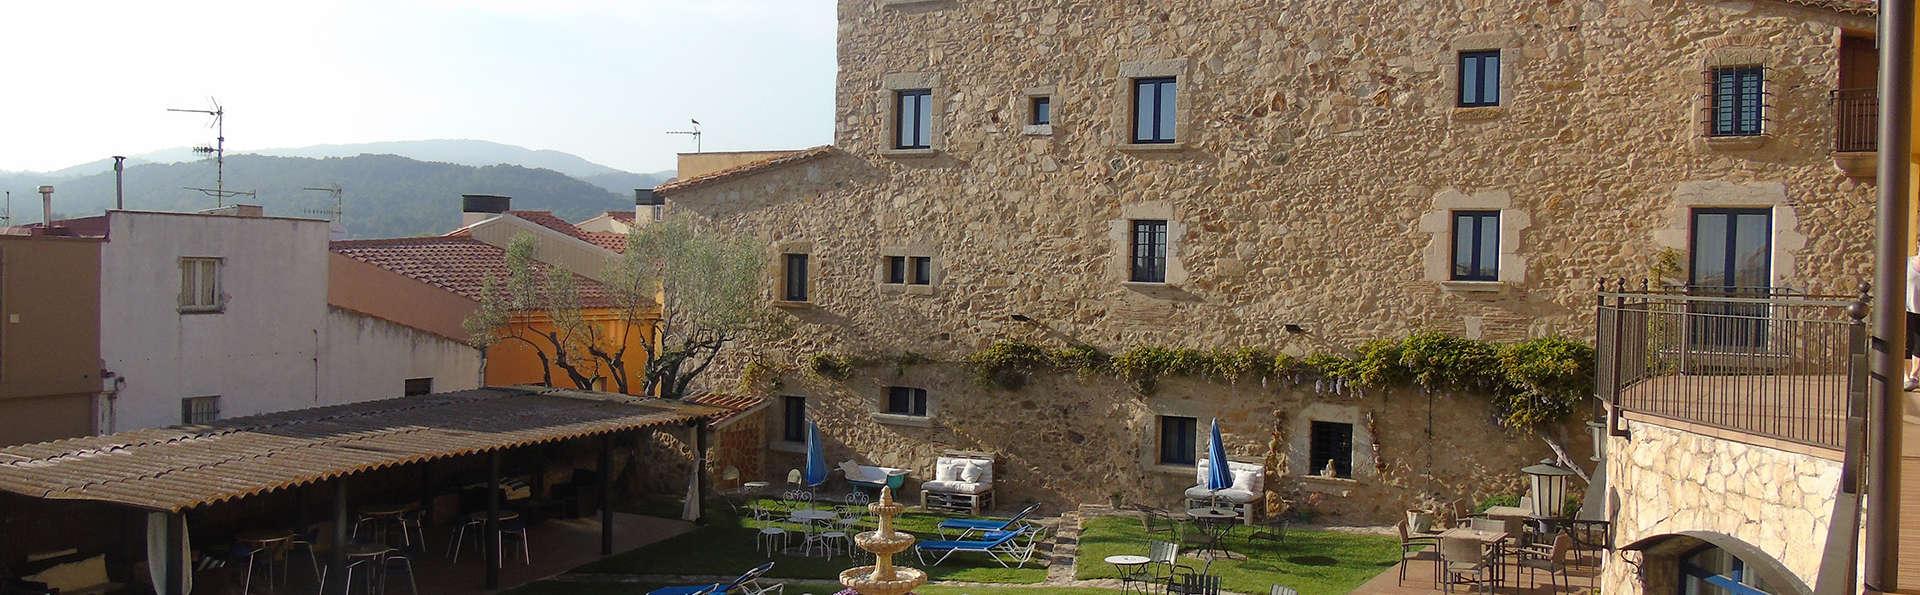 Hotel Gastronómico Sant Joan - EDIT_FRONT_2.jpg